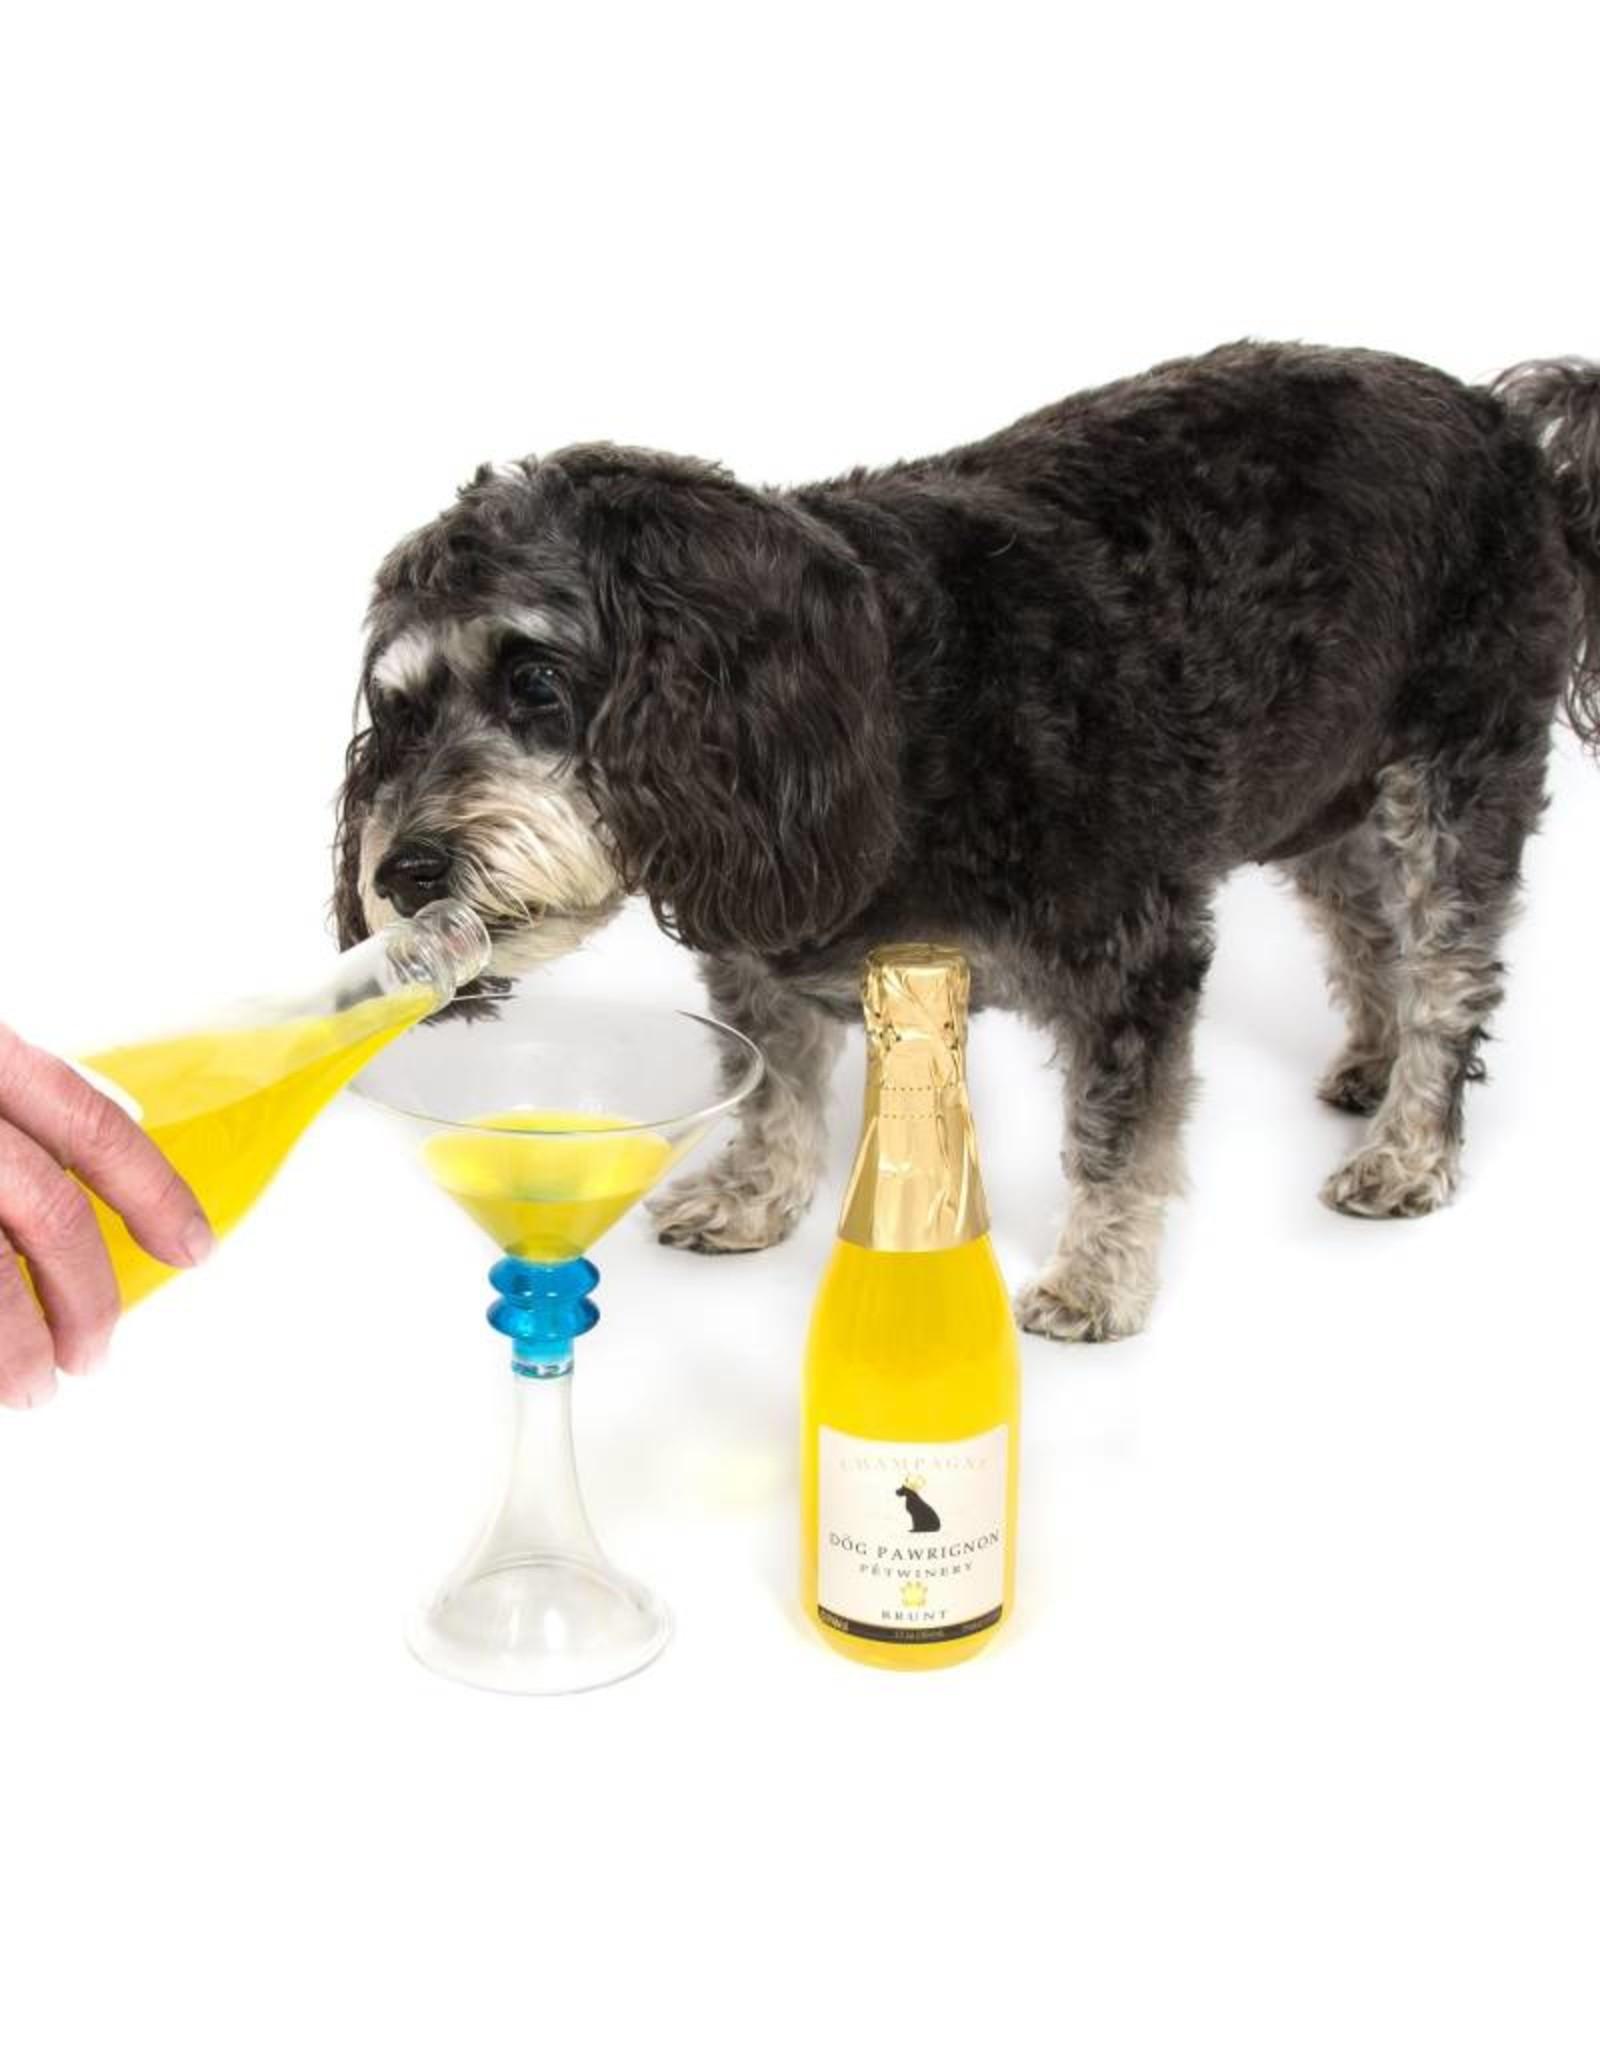 Pet Winery Dög Pawrignon Champagne - Brunt